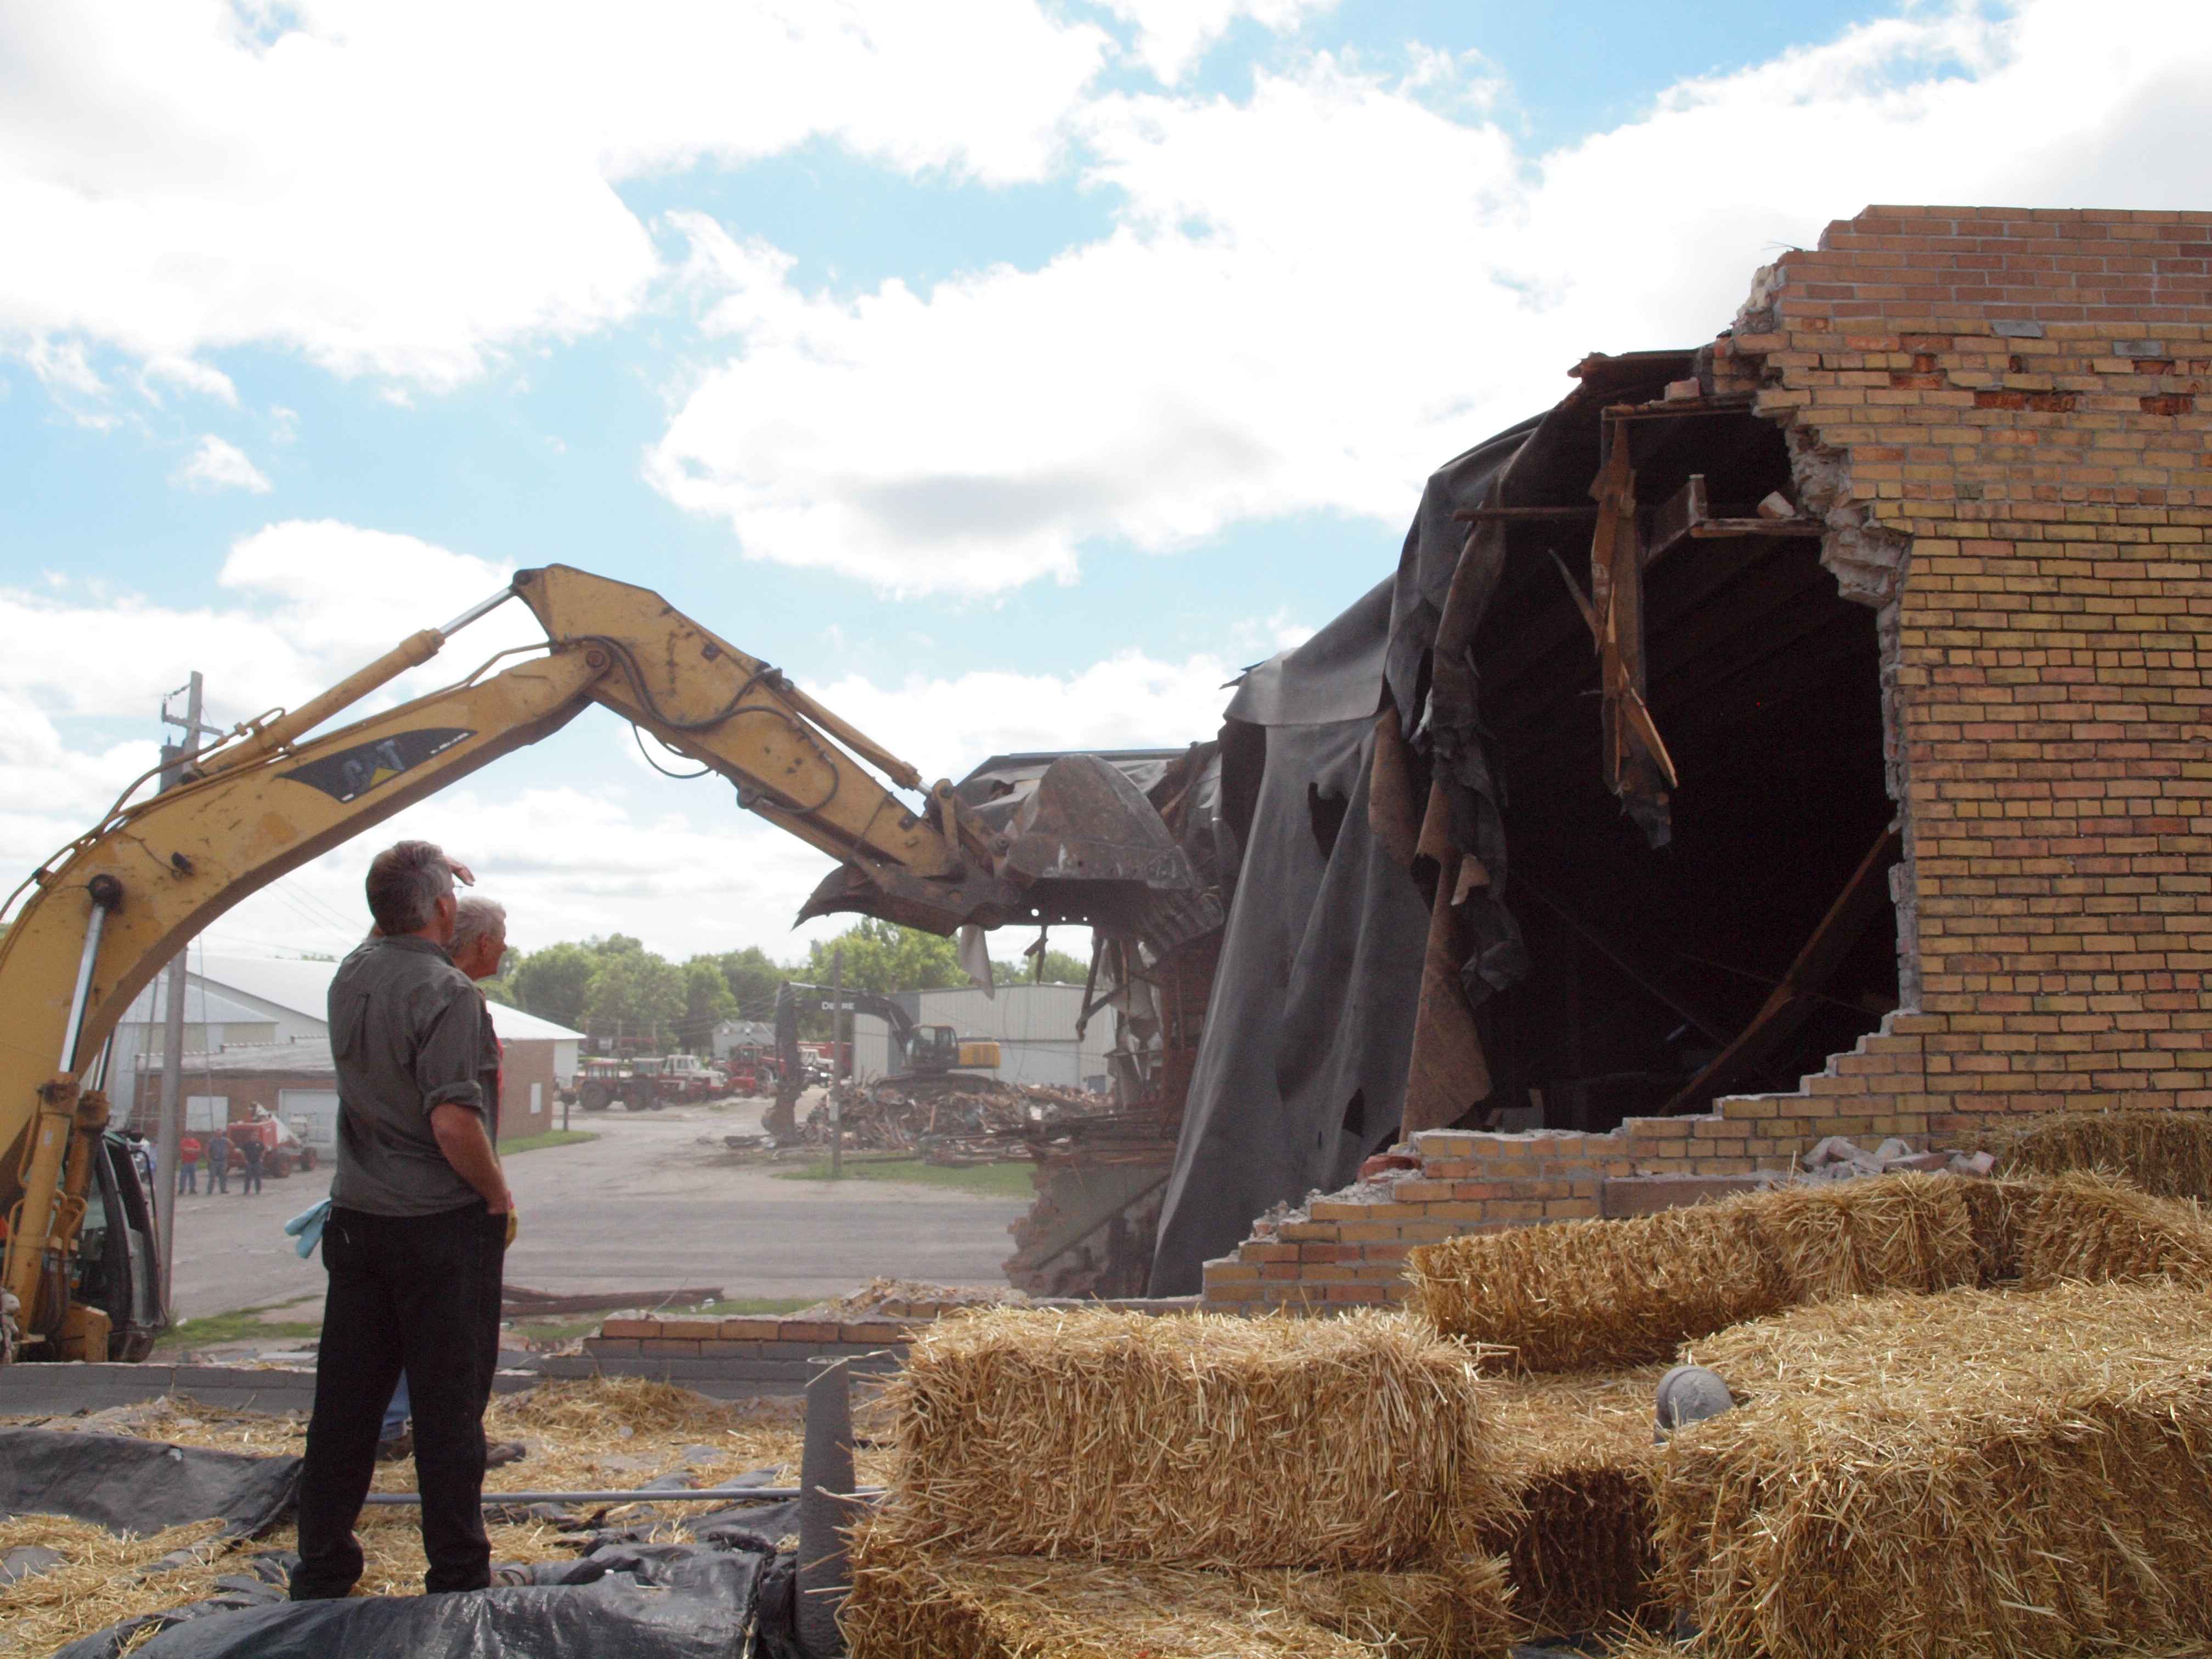 Jim Riley & Sons Construction